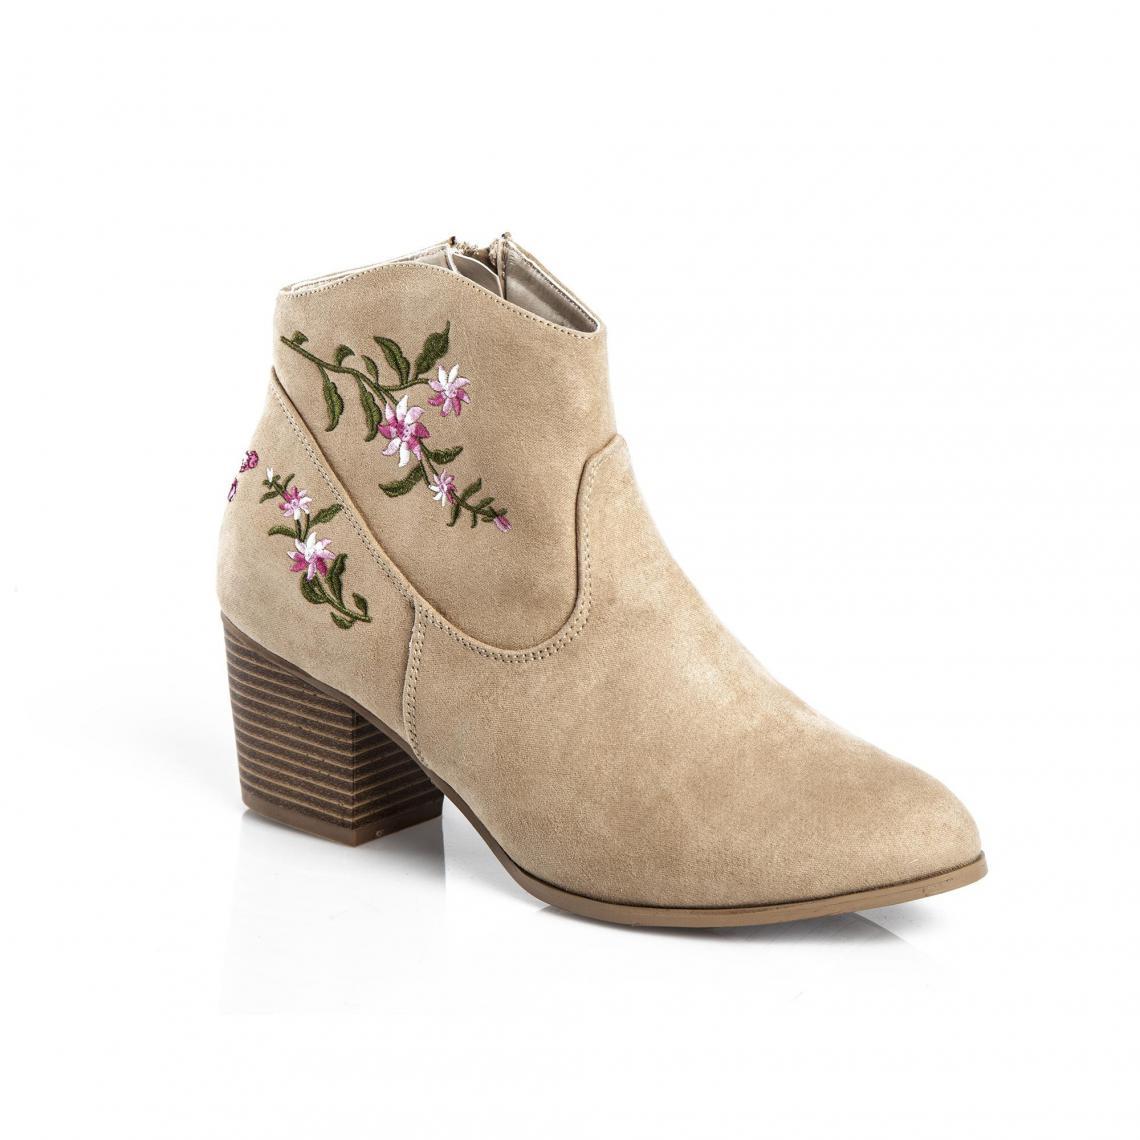 Bottines broderie florale et zip latéral femme - Sable